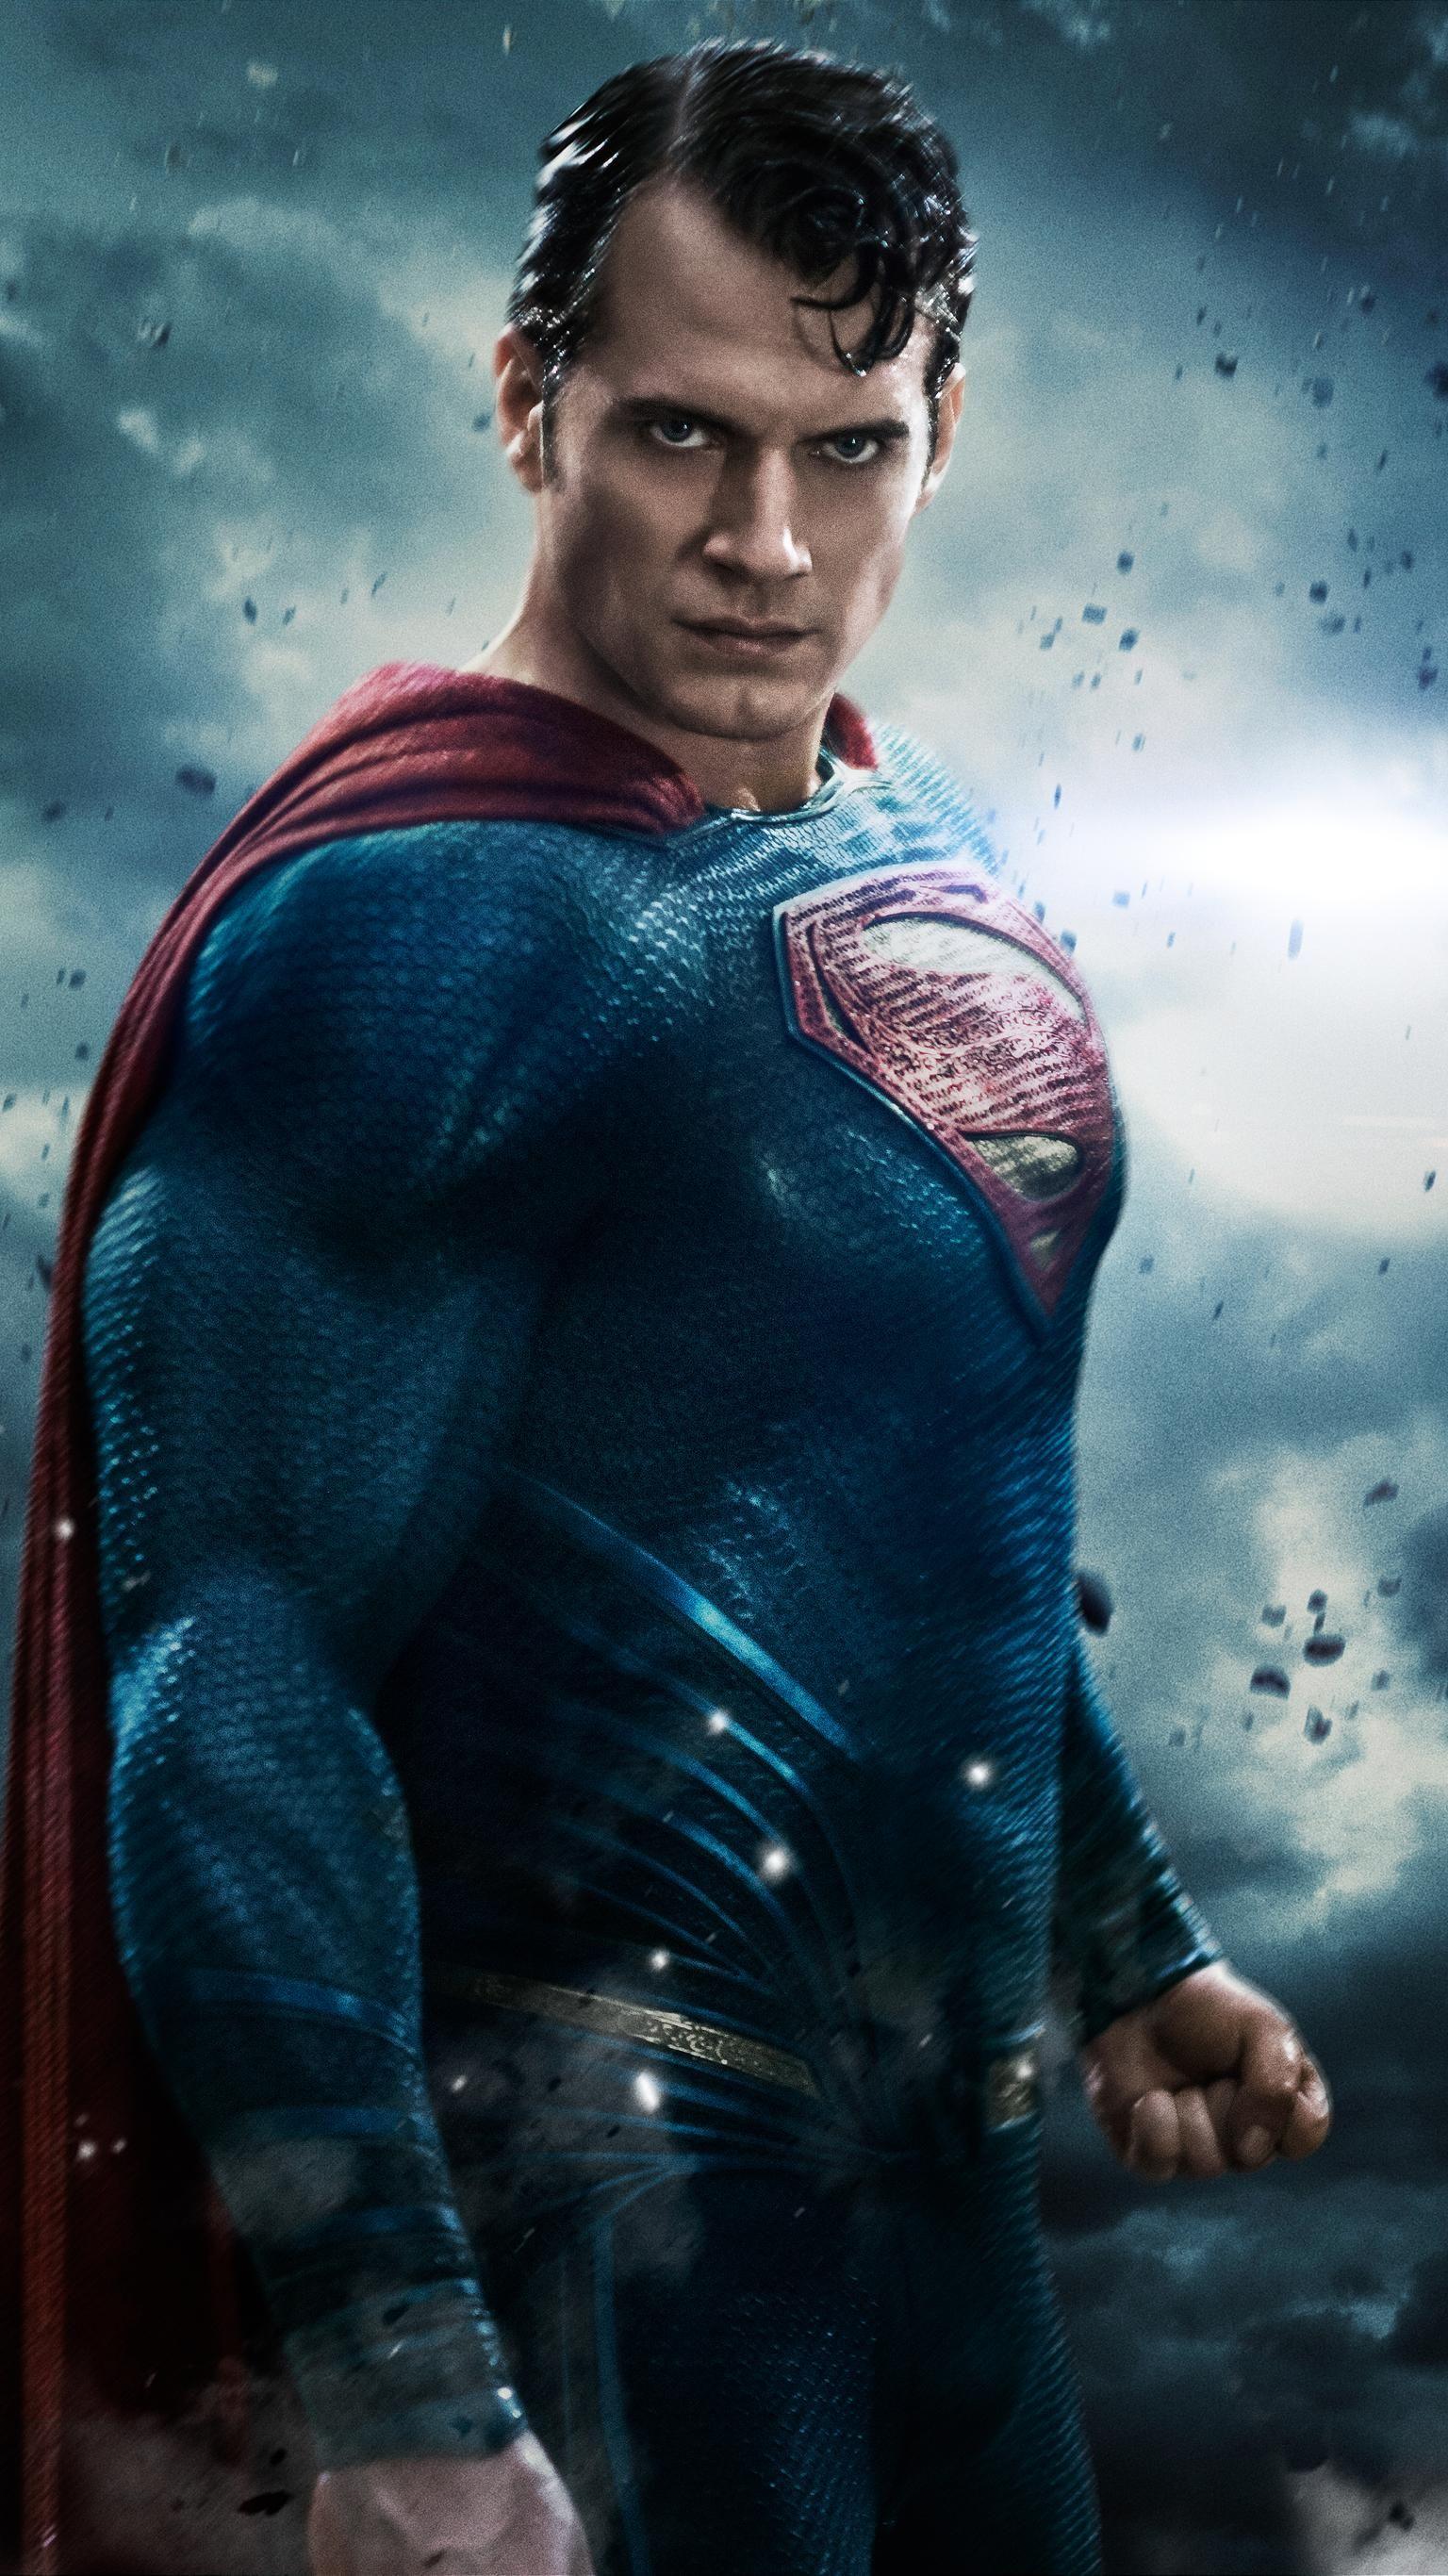 Batman V Superman Dawn Of Justice 2016 Phone Wallpaper Moviemania Superman Characters Superman Wallpaper Batman V Superman Dawn Of Justice